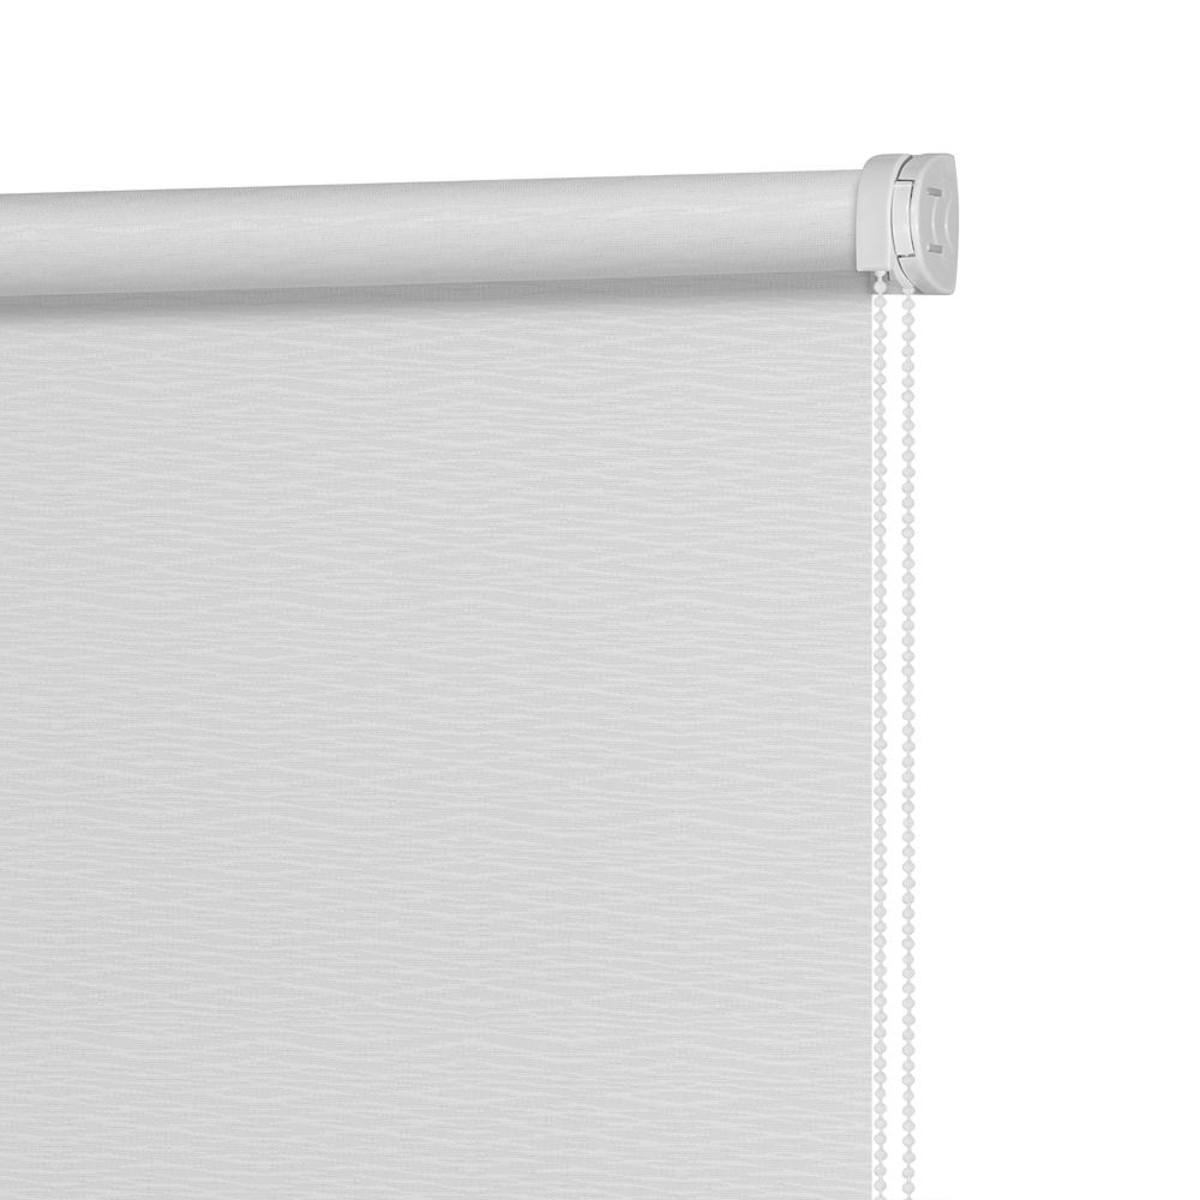 Рулонная Ора Decofest Маринела 60Х160 Цвет Серый